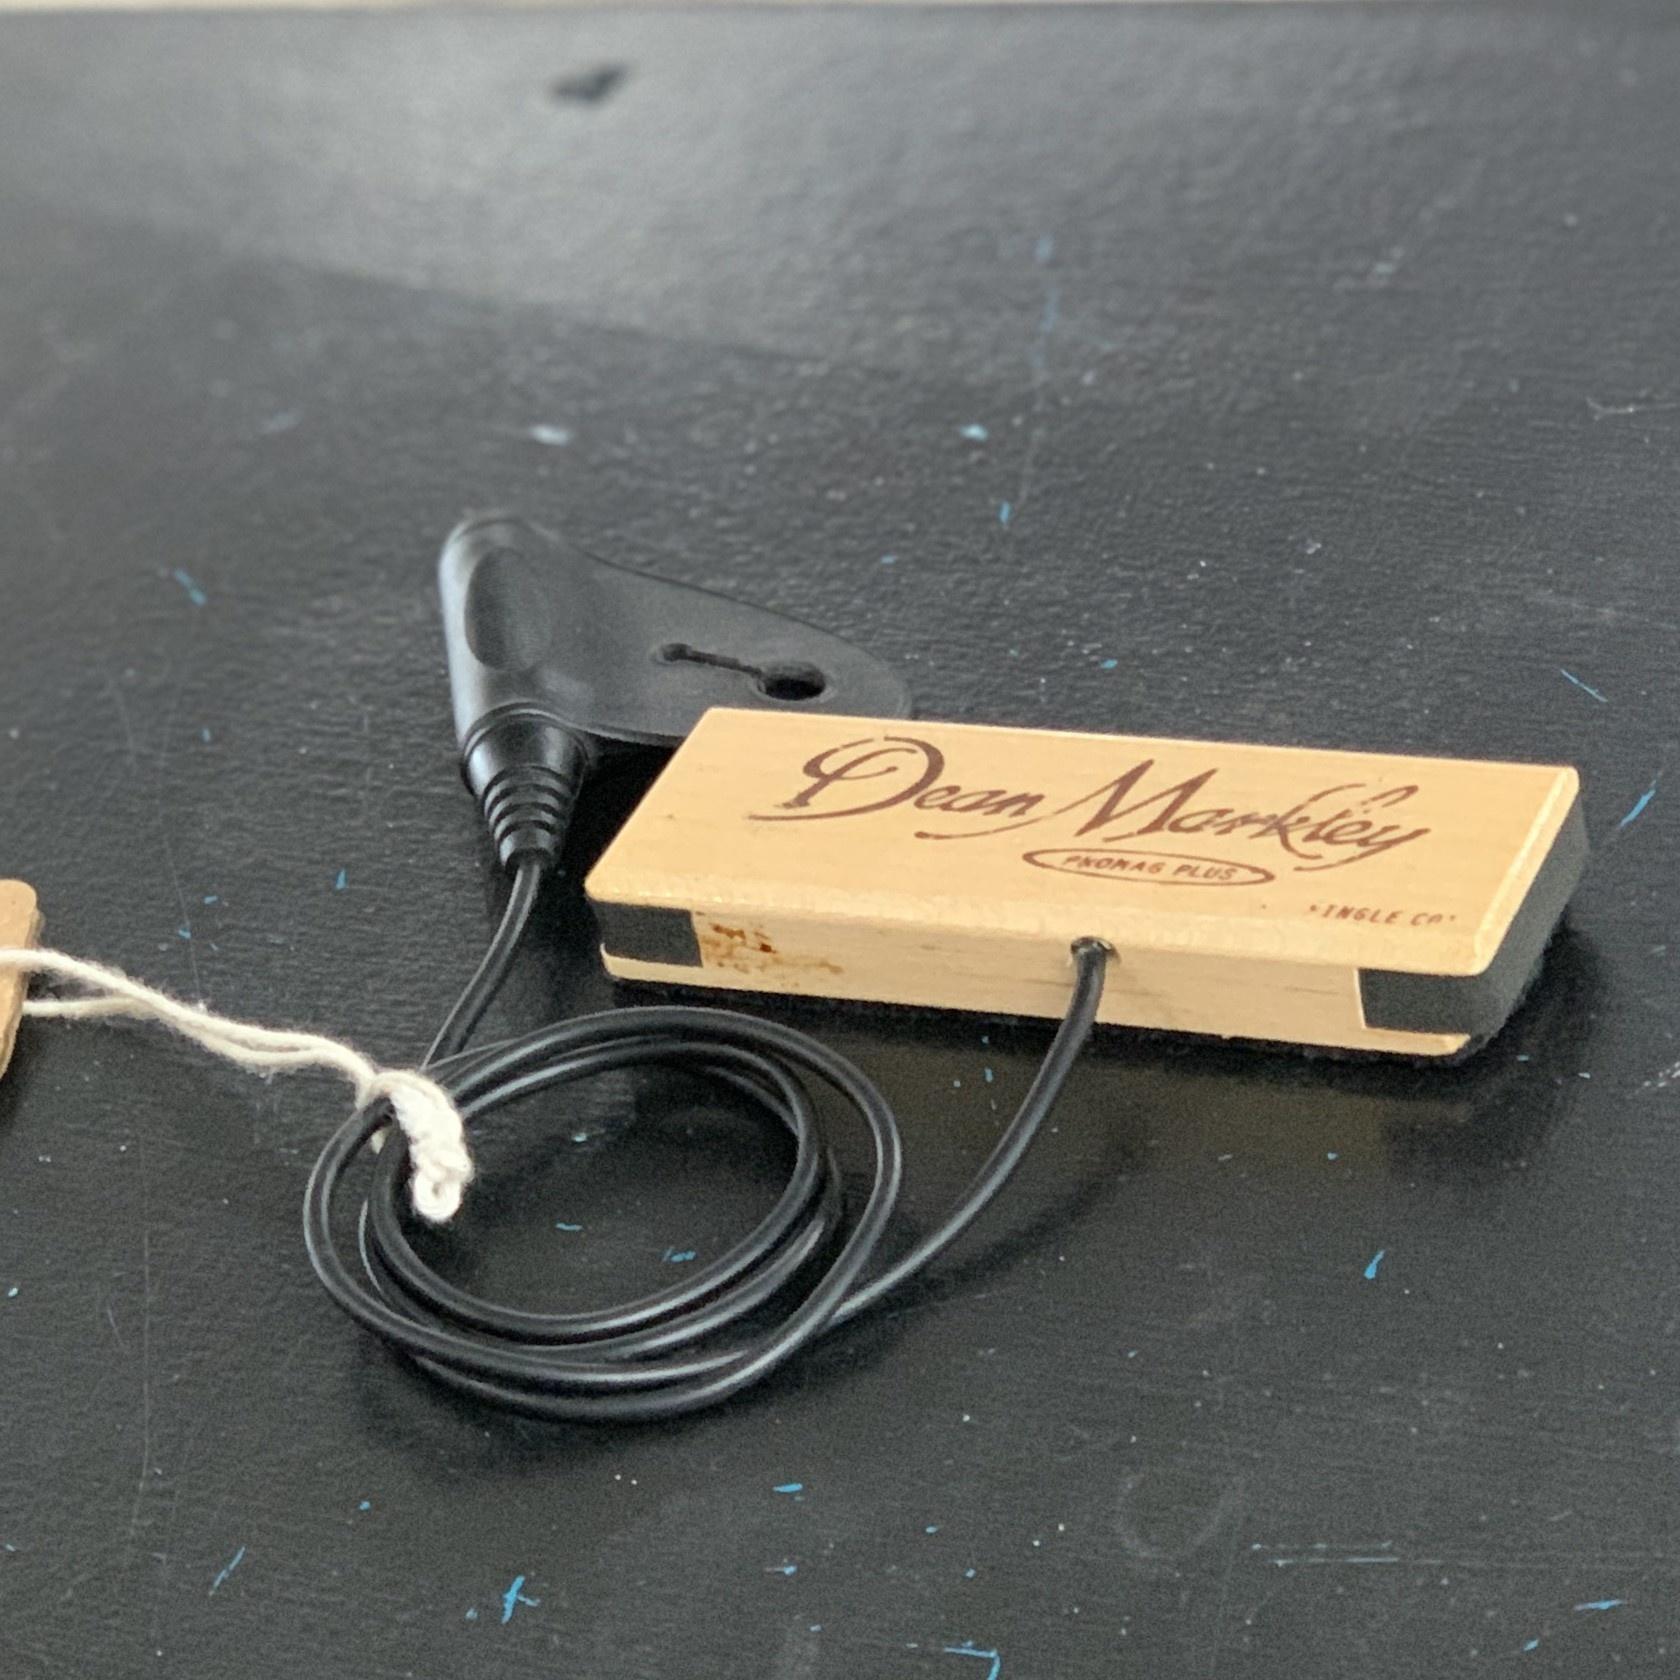 Dean Markley Promag Plus (Single Coil) [Used]-1